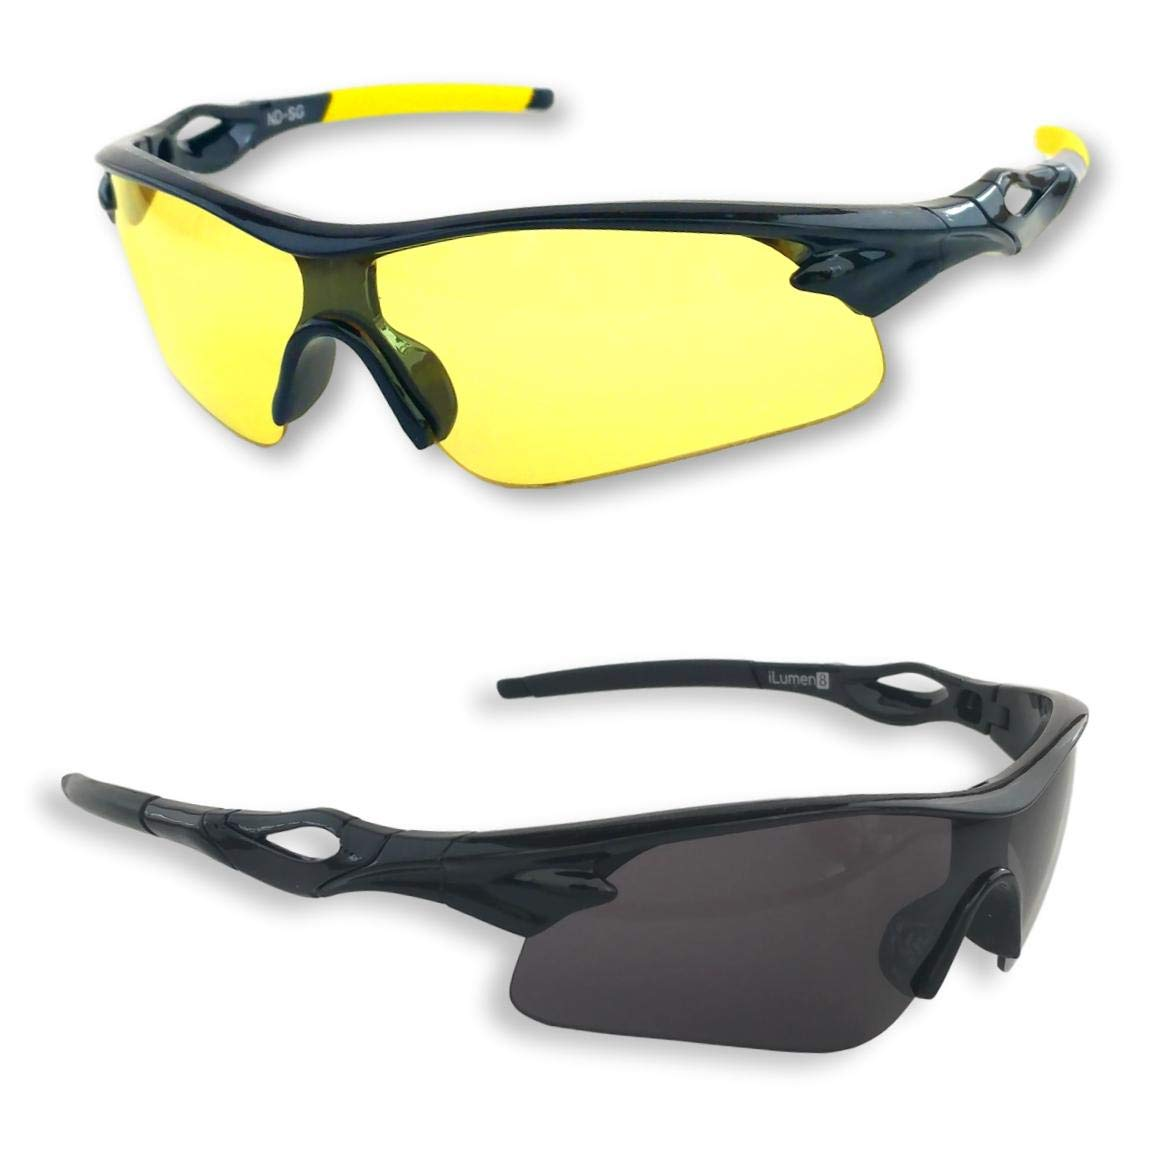 iLumen8 Best Shooting Glasses UV Blacklight Flashlight Yellow Safety Eye Protection See Dog Cat Urine with Amber Black Lights Night Vision Ultraviolet (Yellow & Black, 2 Pair) by iLumen8